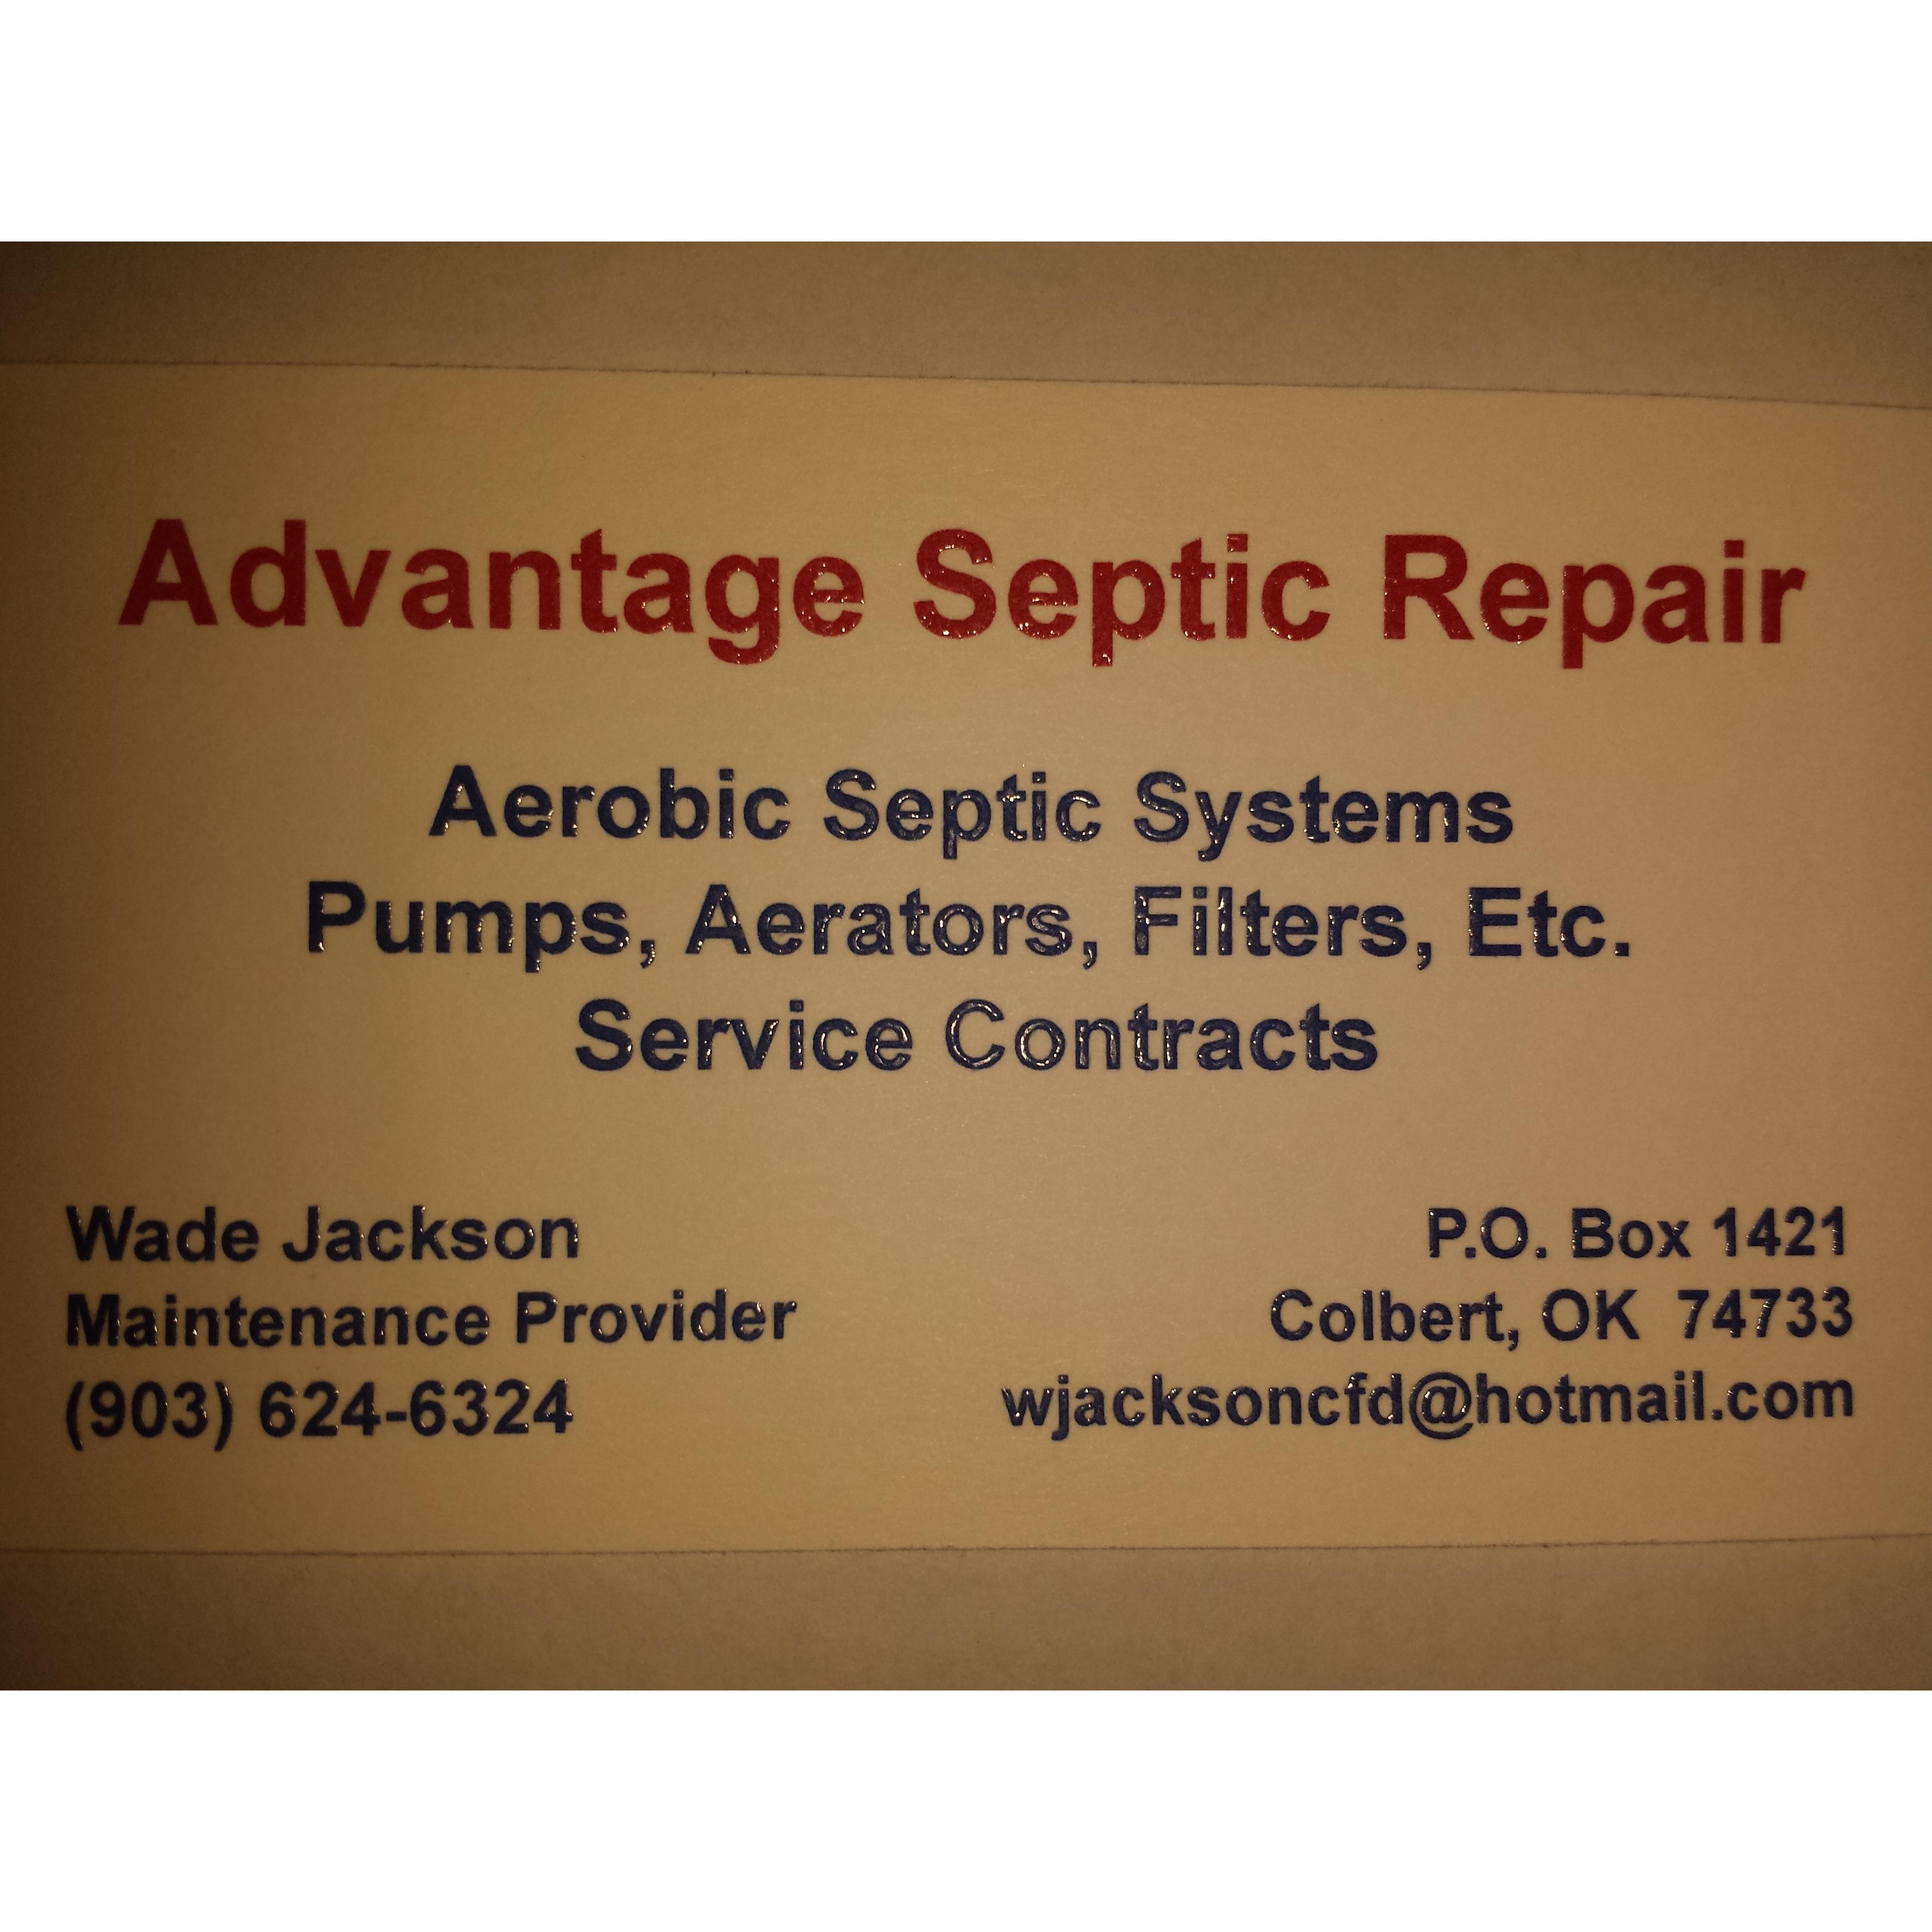 Advantage Septic Repair